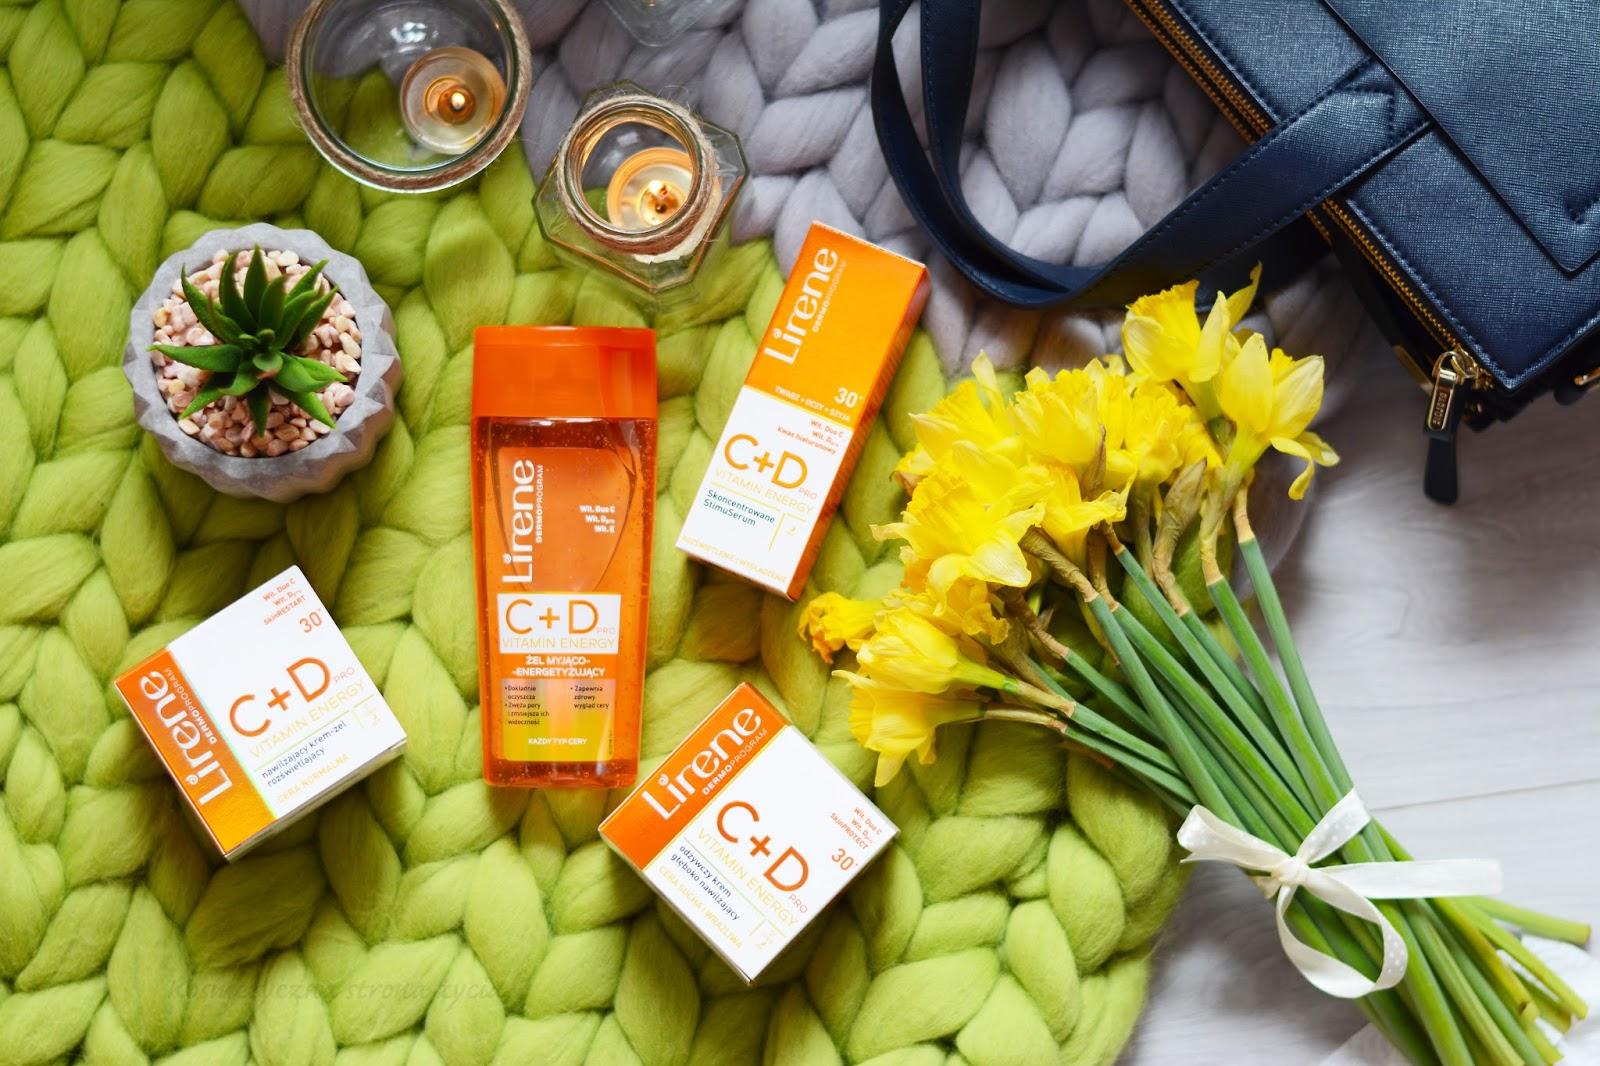 Lirene C+D Pro Vitamin Energy żel, krem, stimuserum